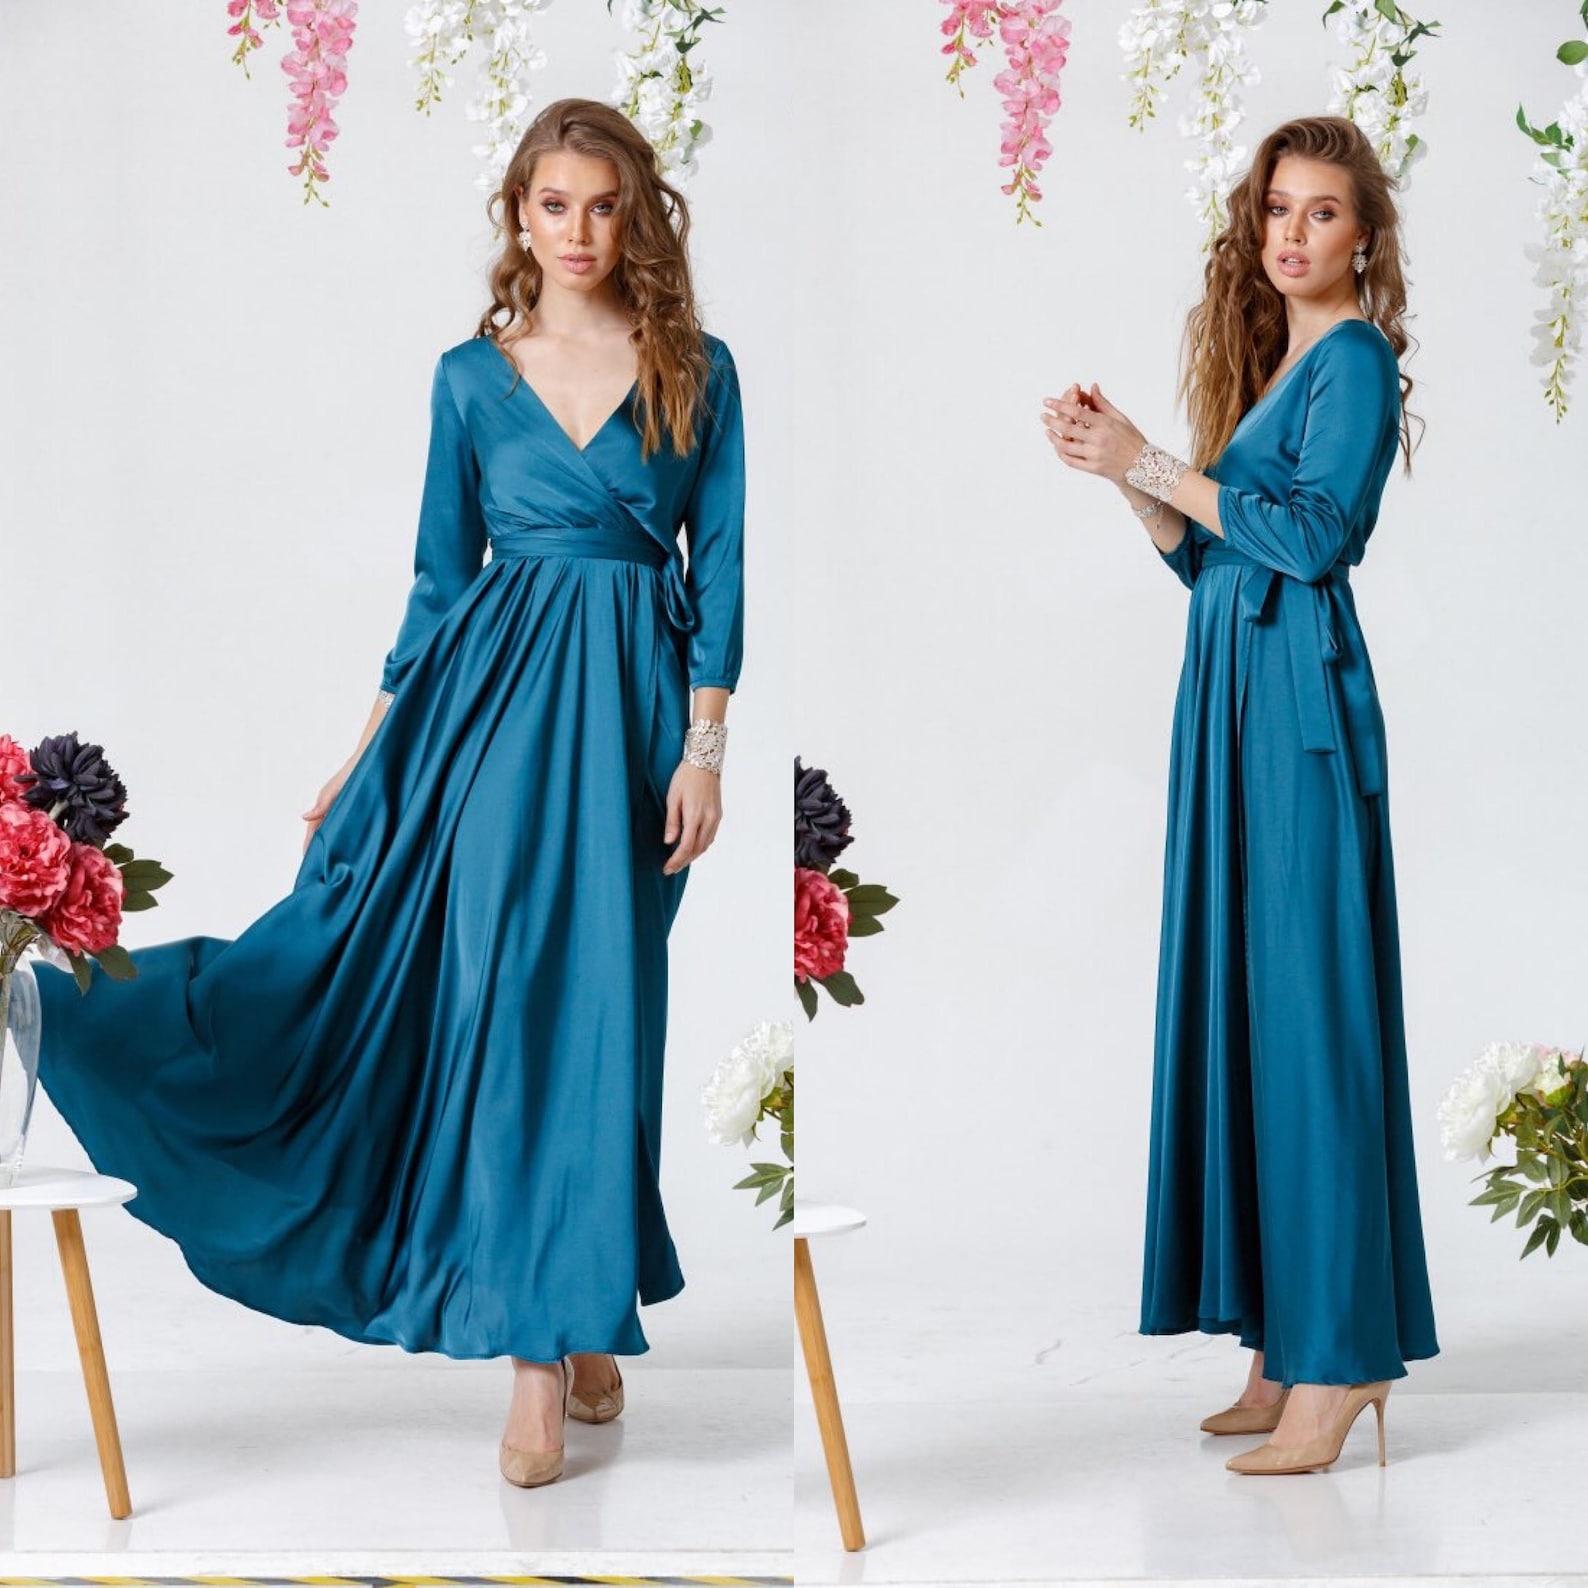 Three-quarter sleeve bridesmaid dress